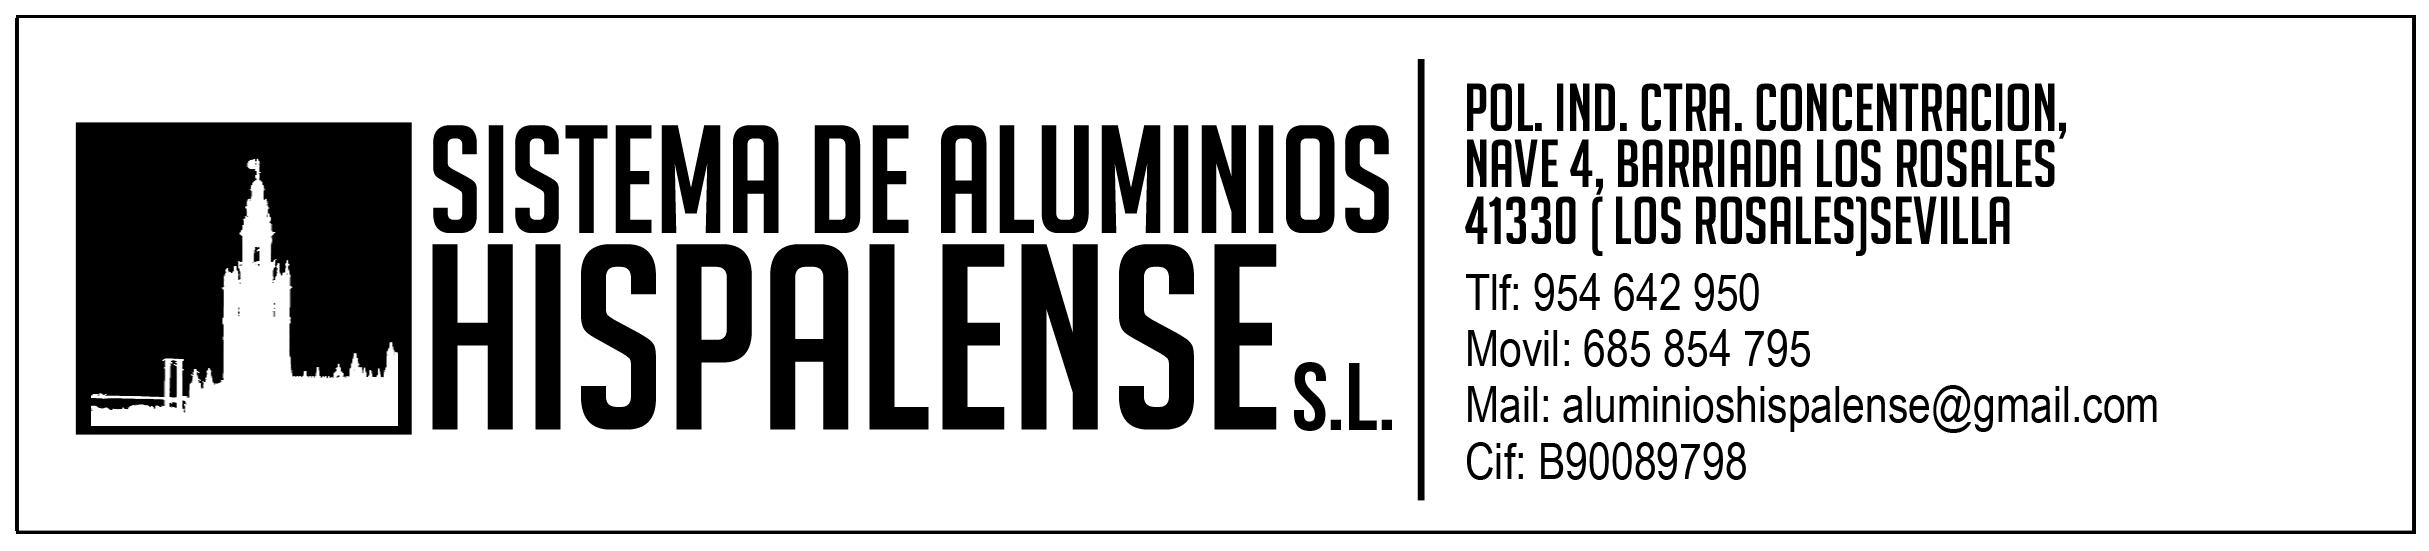 Sistema de Aluminios Hispalense S.L.